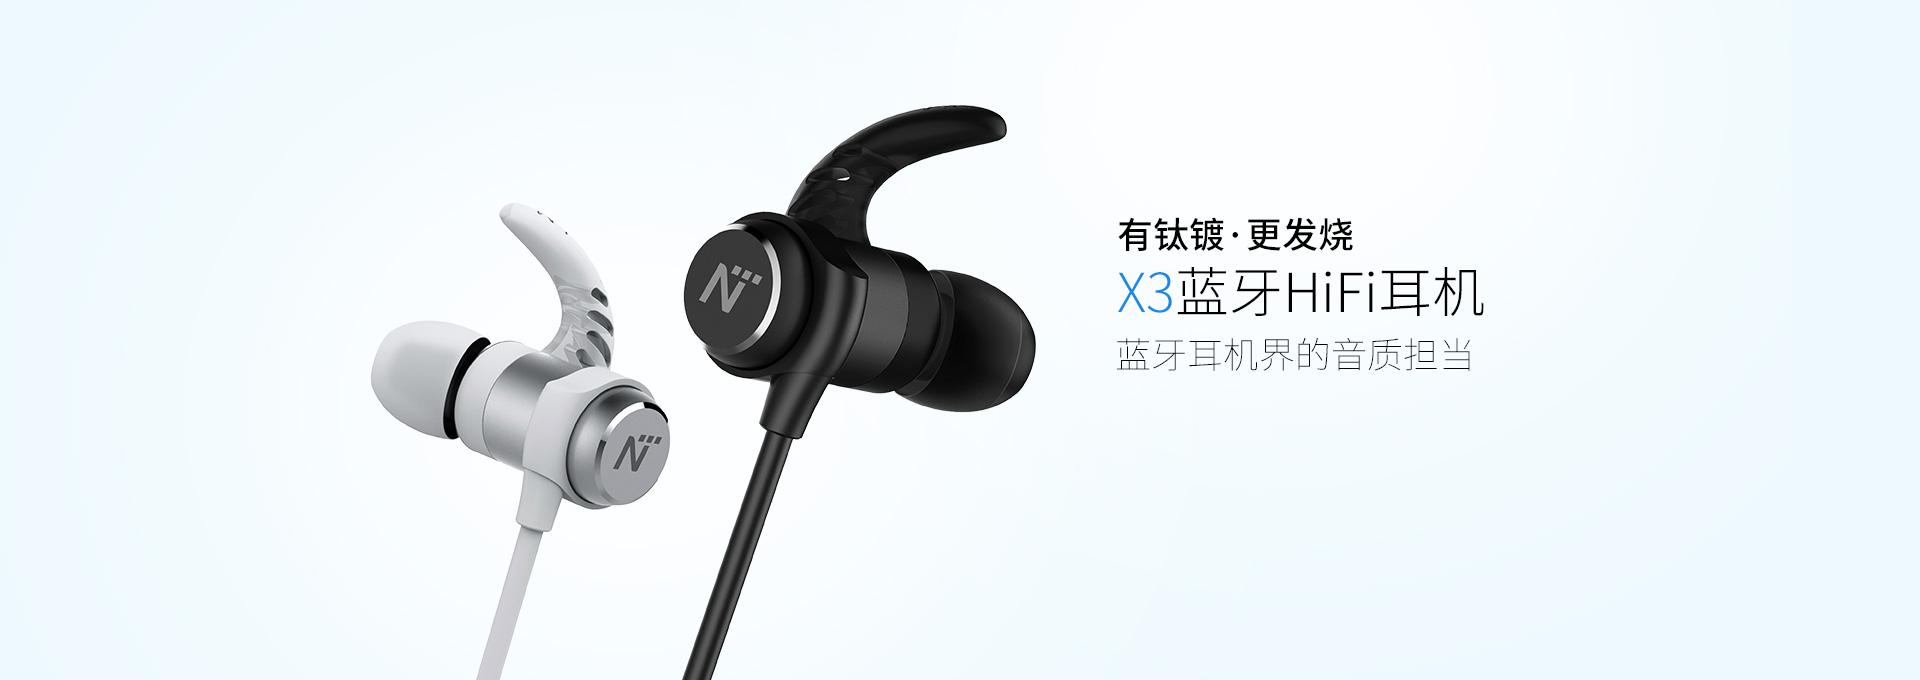 X3蓝牙HiFi耳机